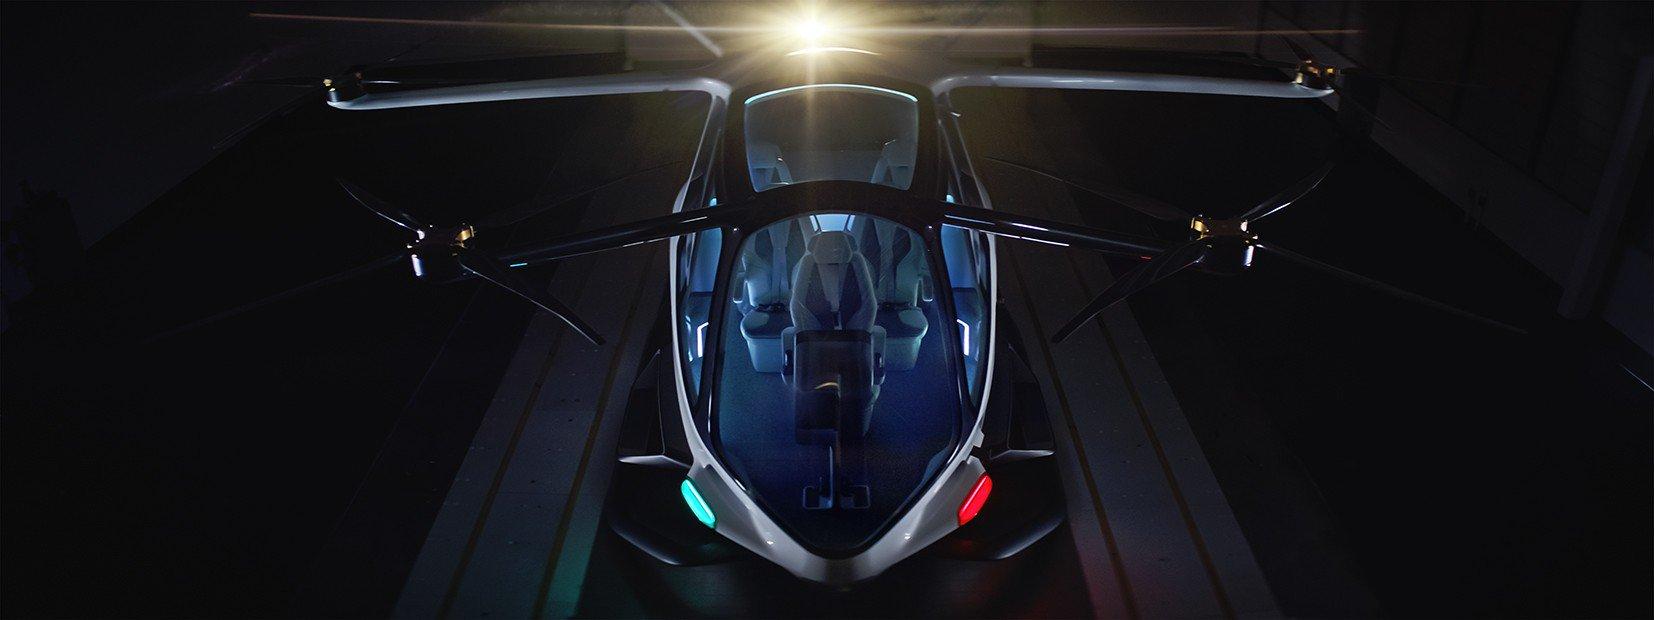 Alakai-Technologies-Skai-flying-car-5